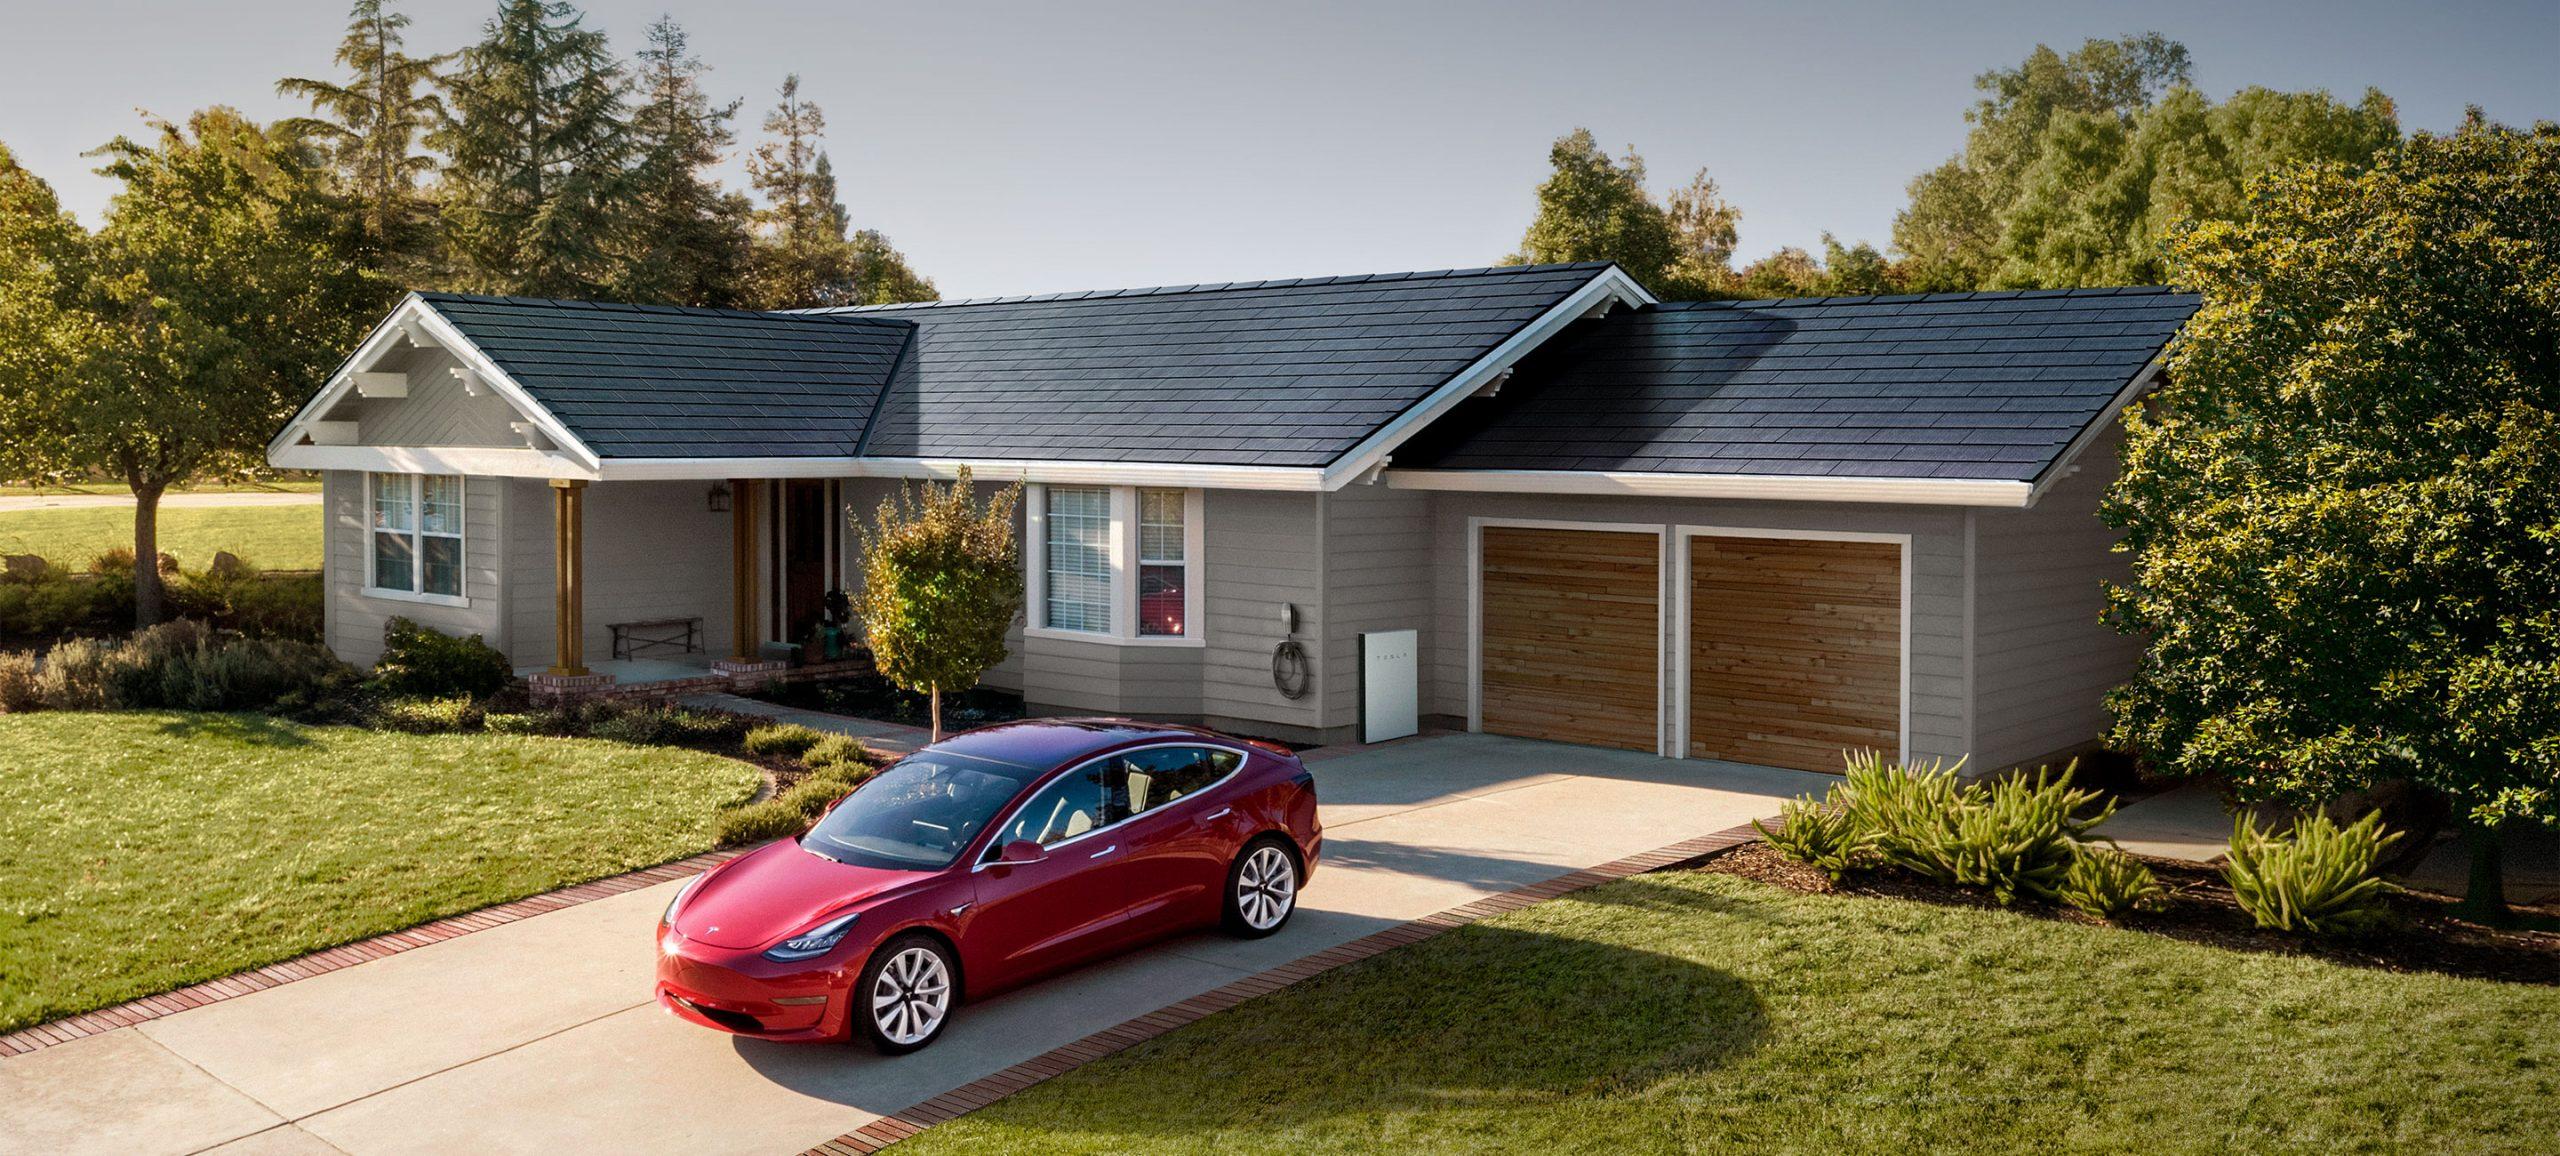 Tesla Solar Roof tiles slates